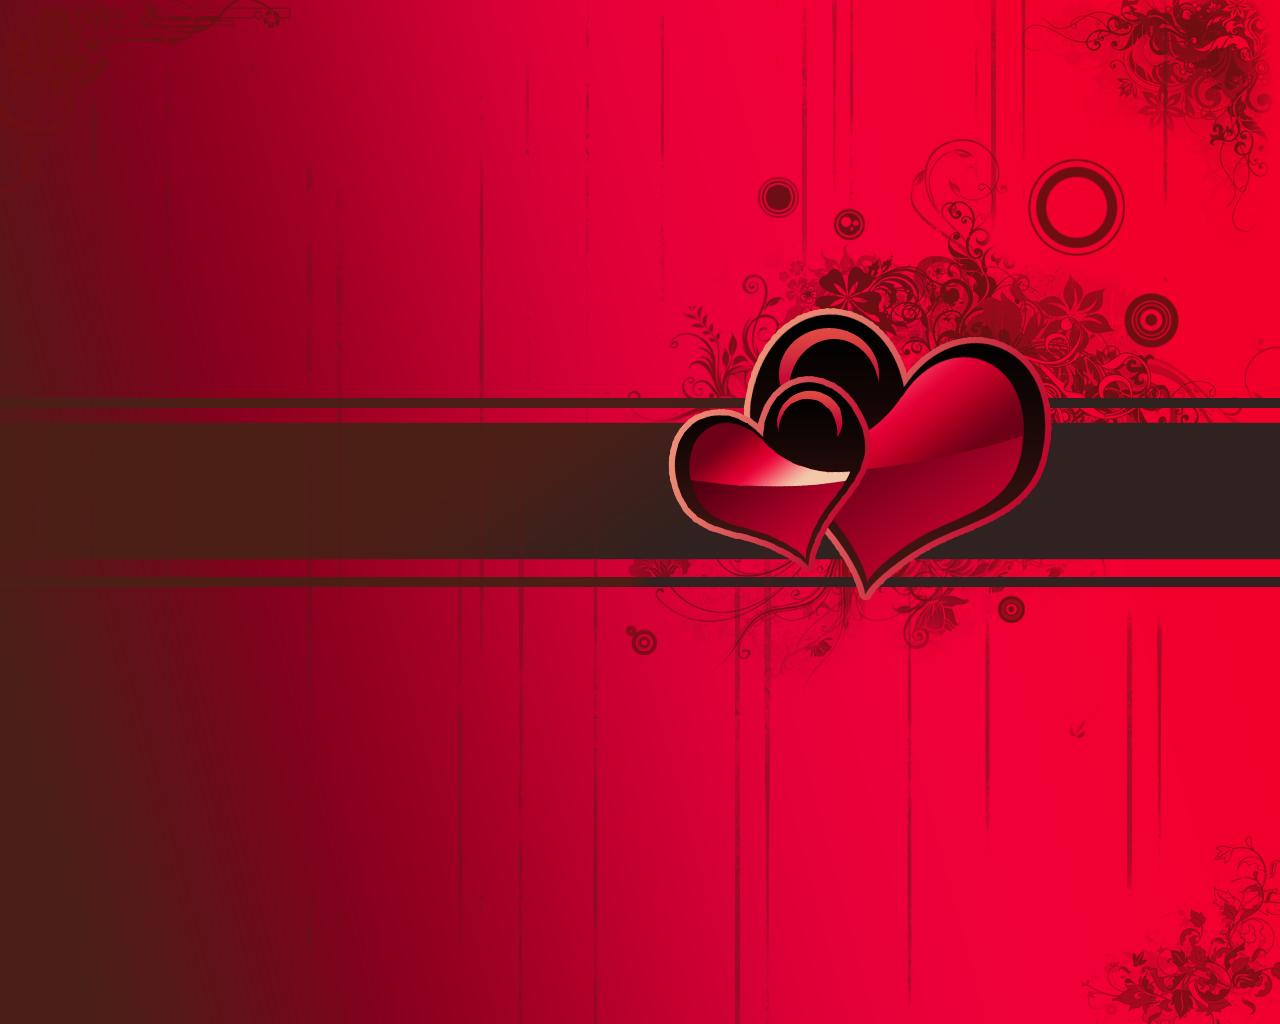 valentine wallpaper pictures 2015   Grasscloth Wallpaper 1280x1024